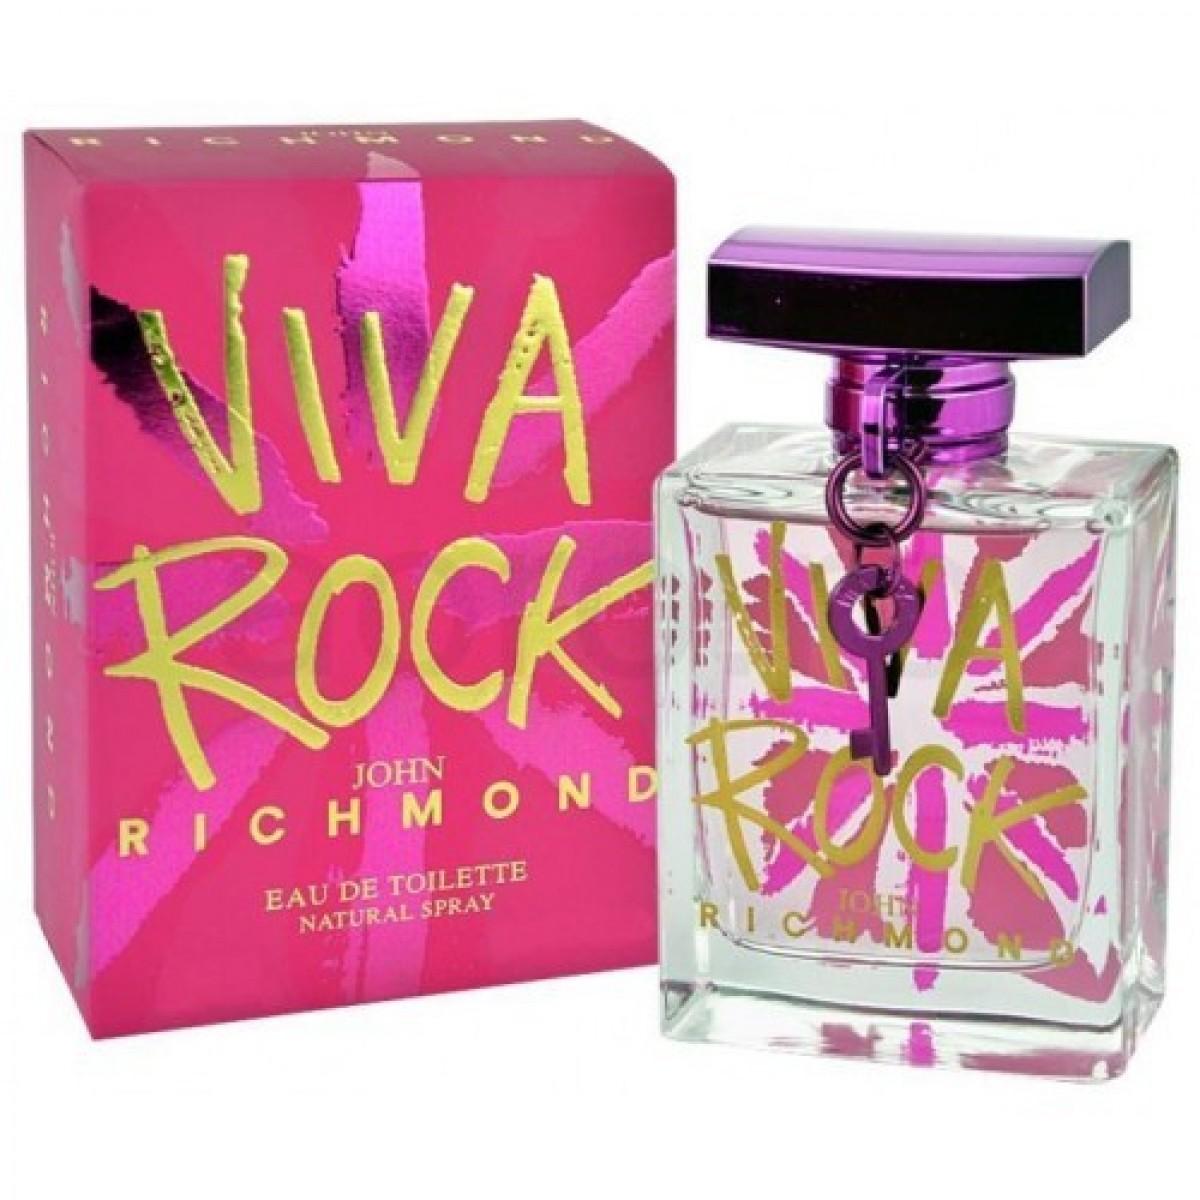 Viva Rock